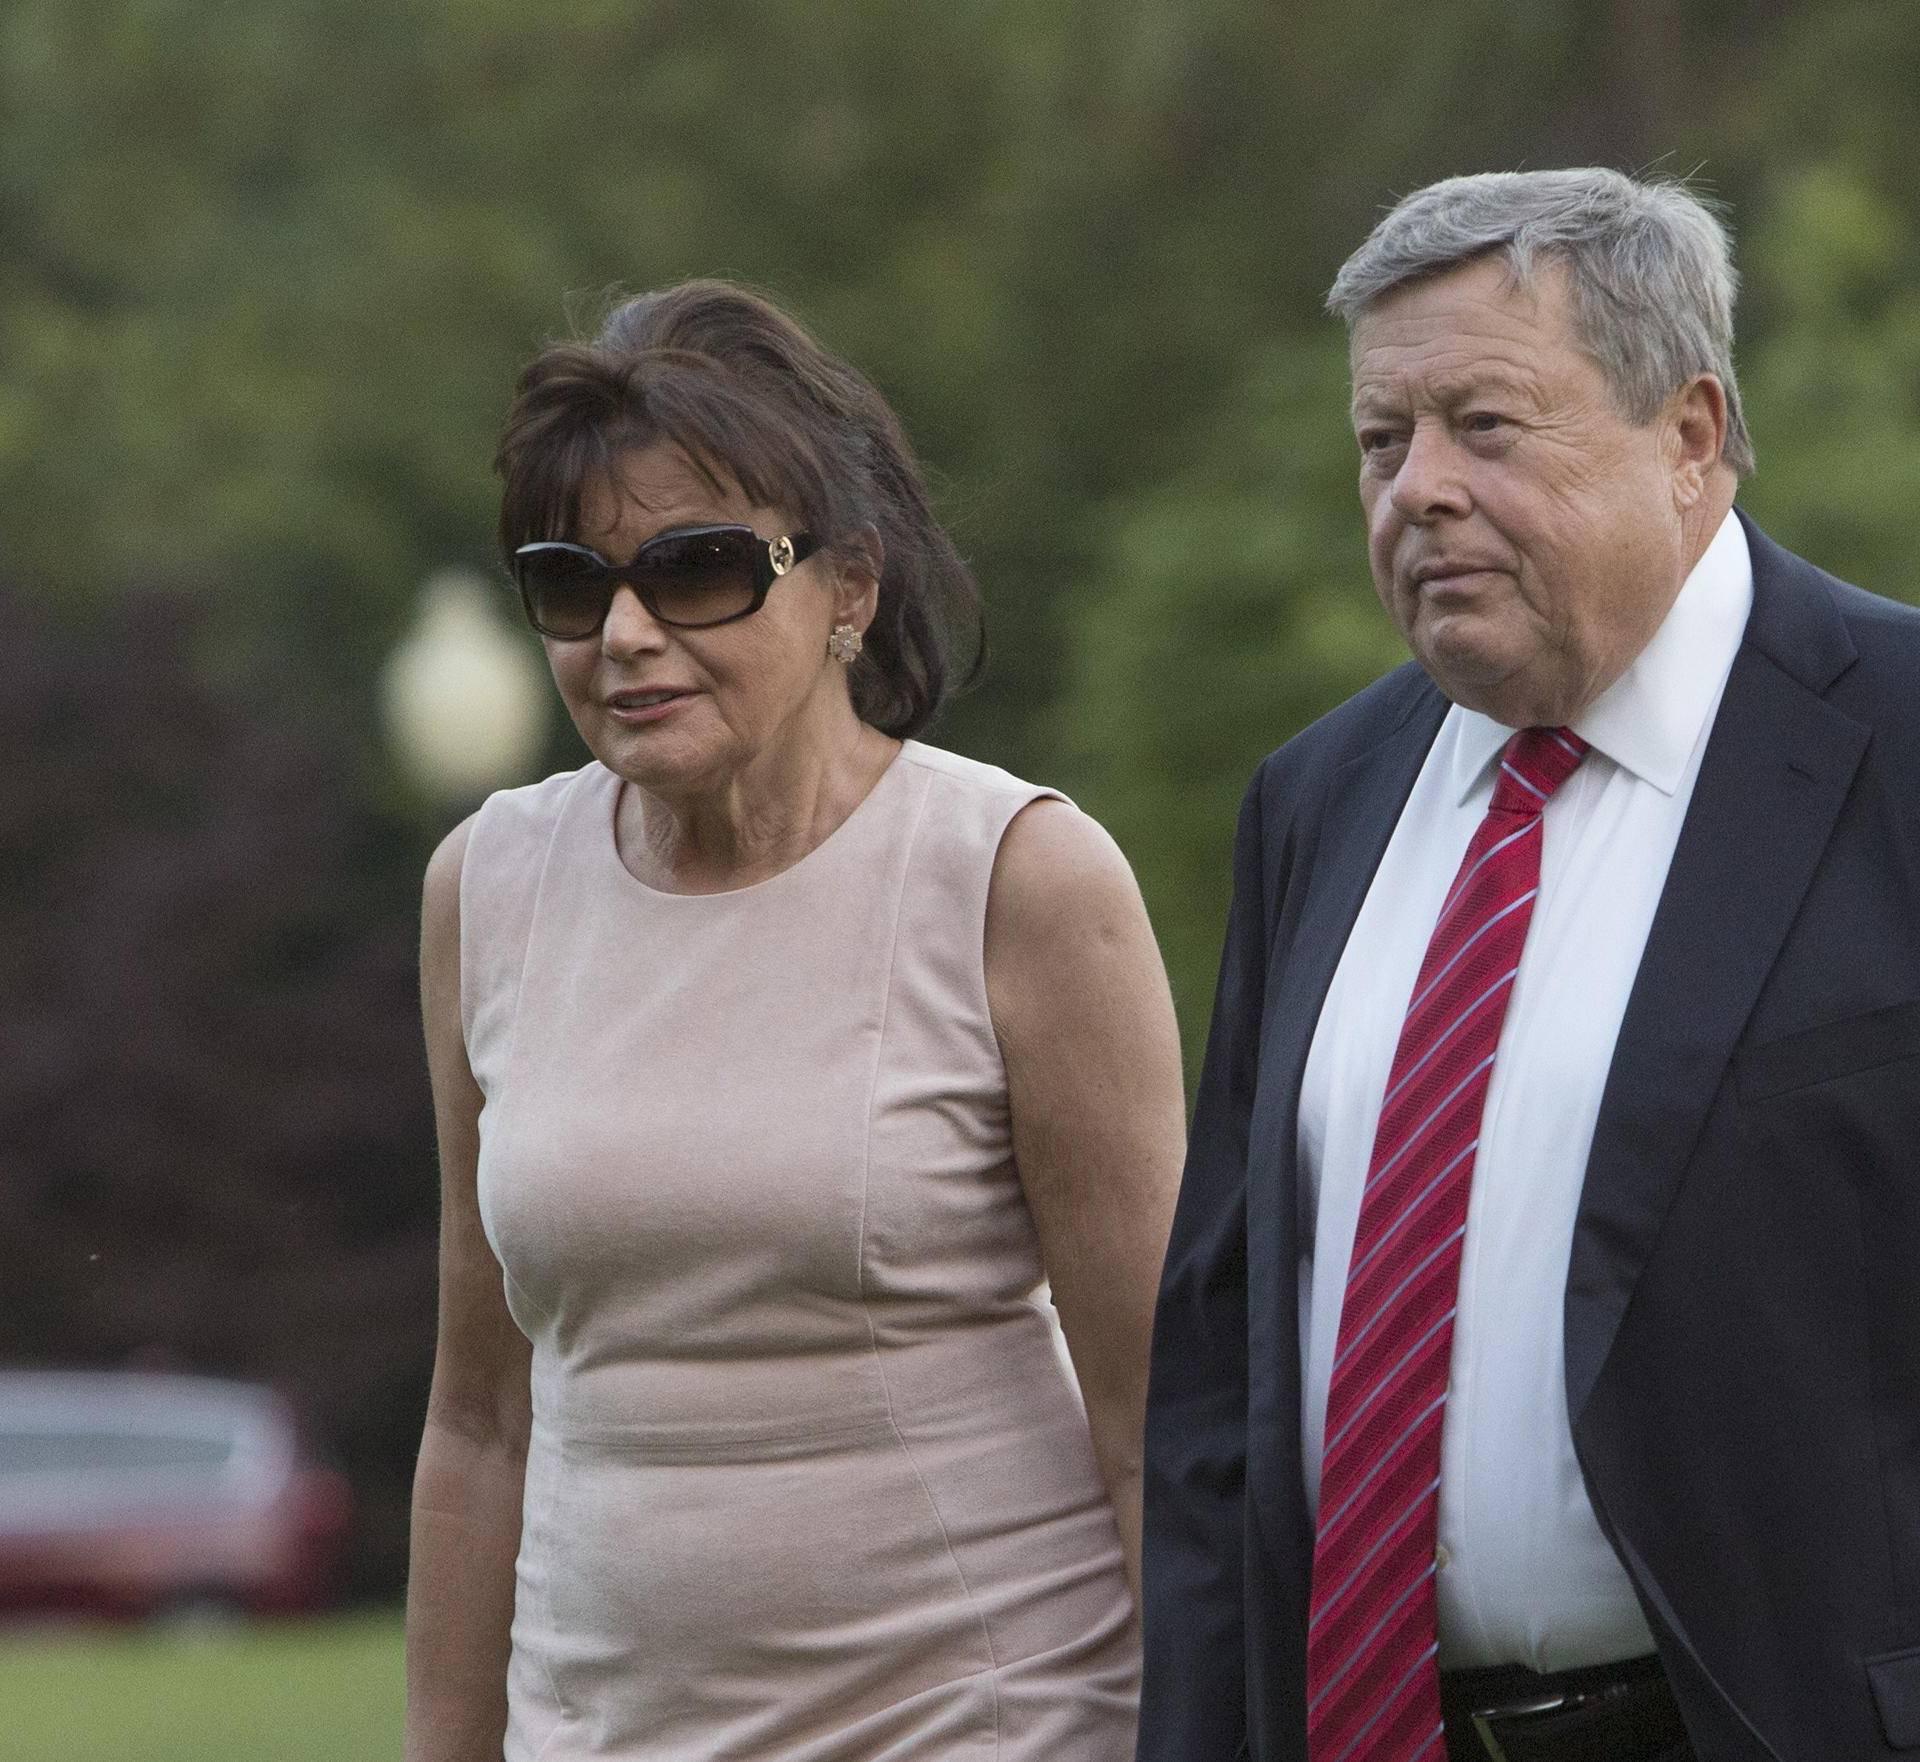 Trumps Arrive from Bedminster, NJ